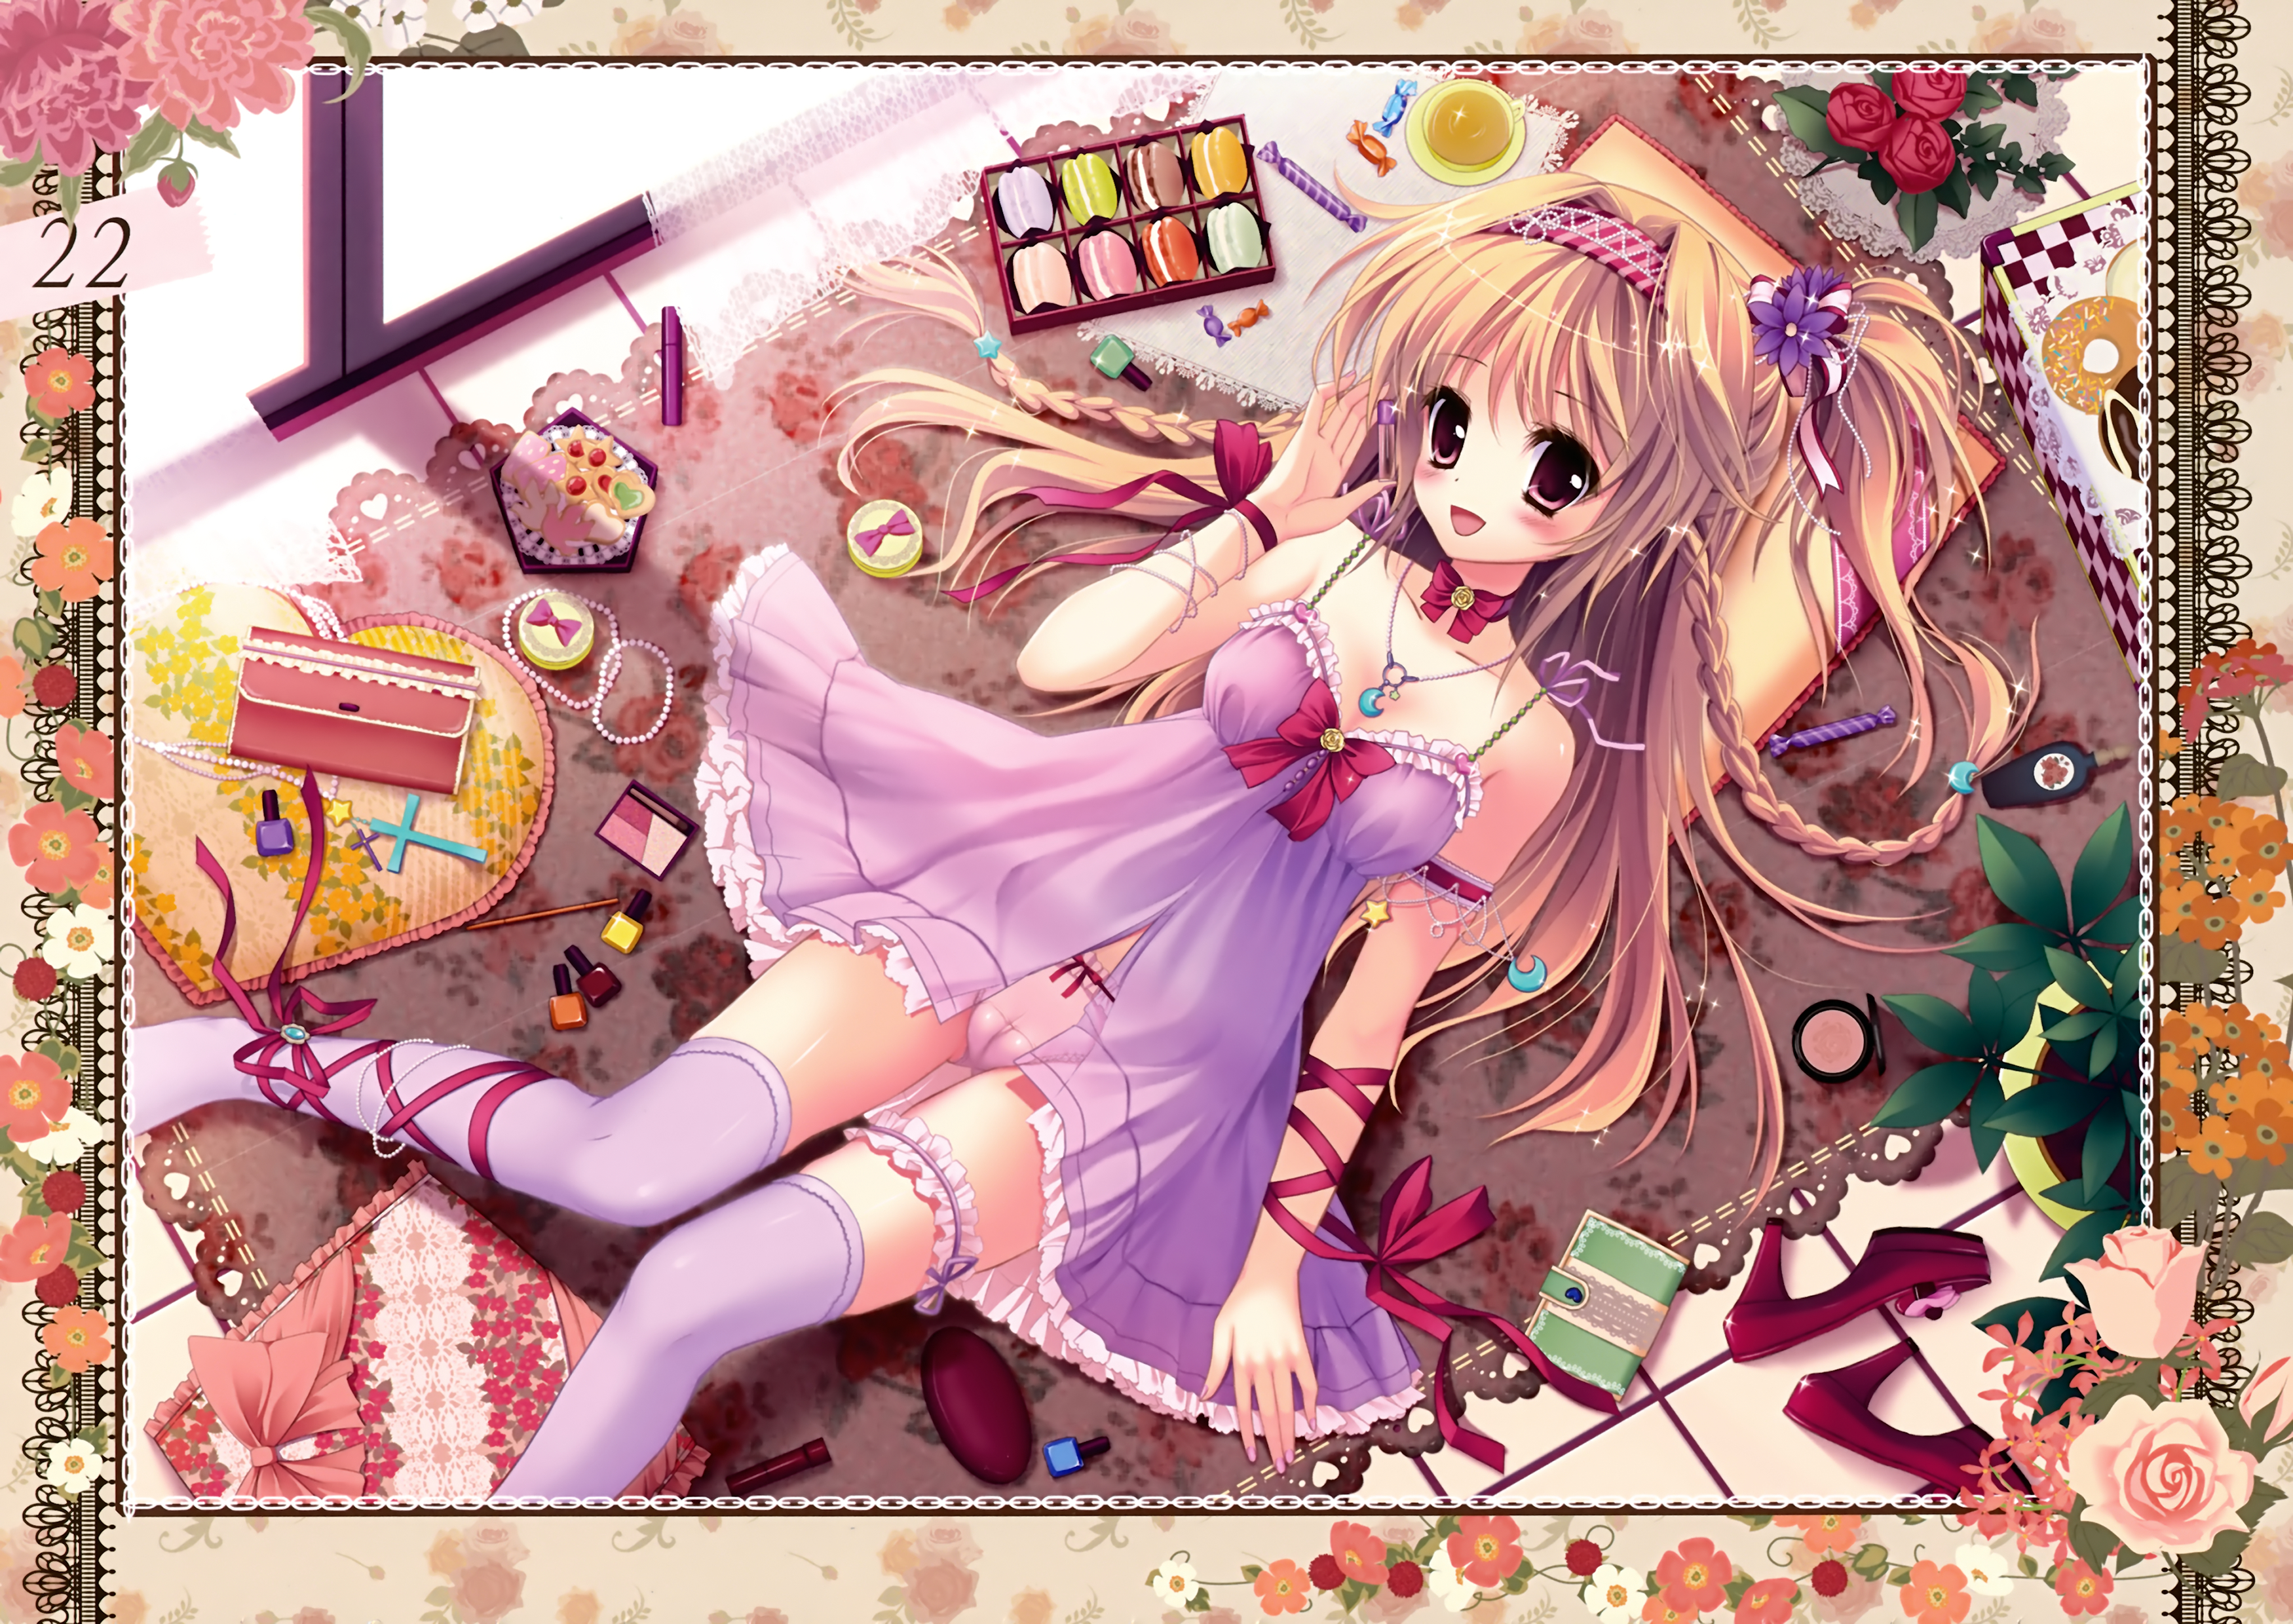 Shiramori Yuse Image #1736824 - Zerochan Anime Image Board